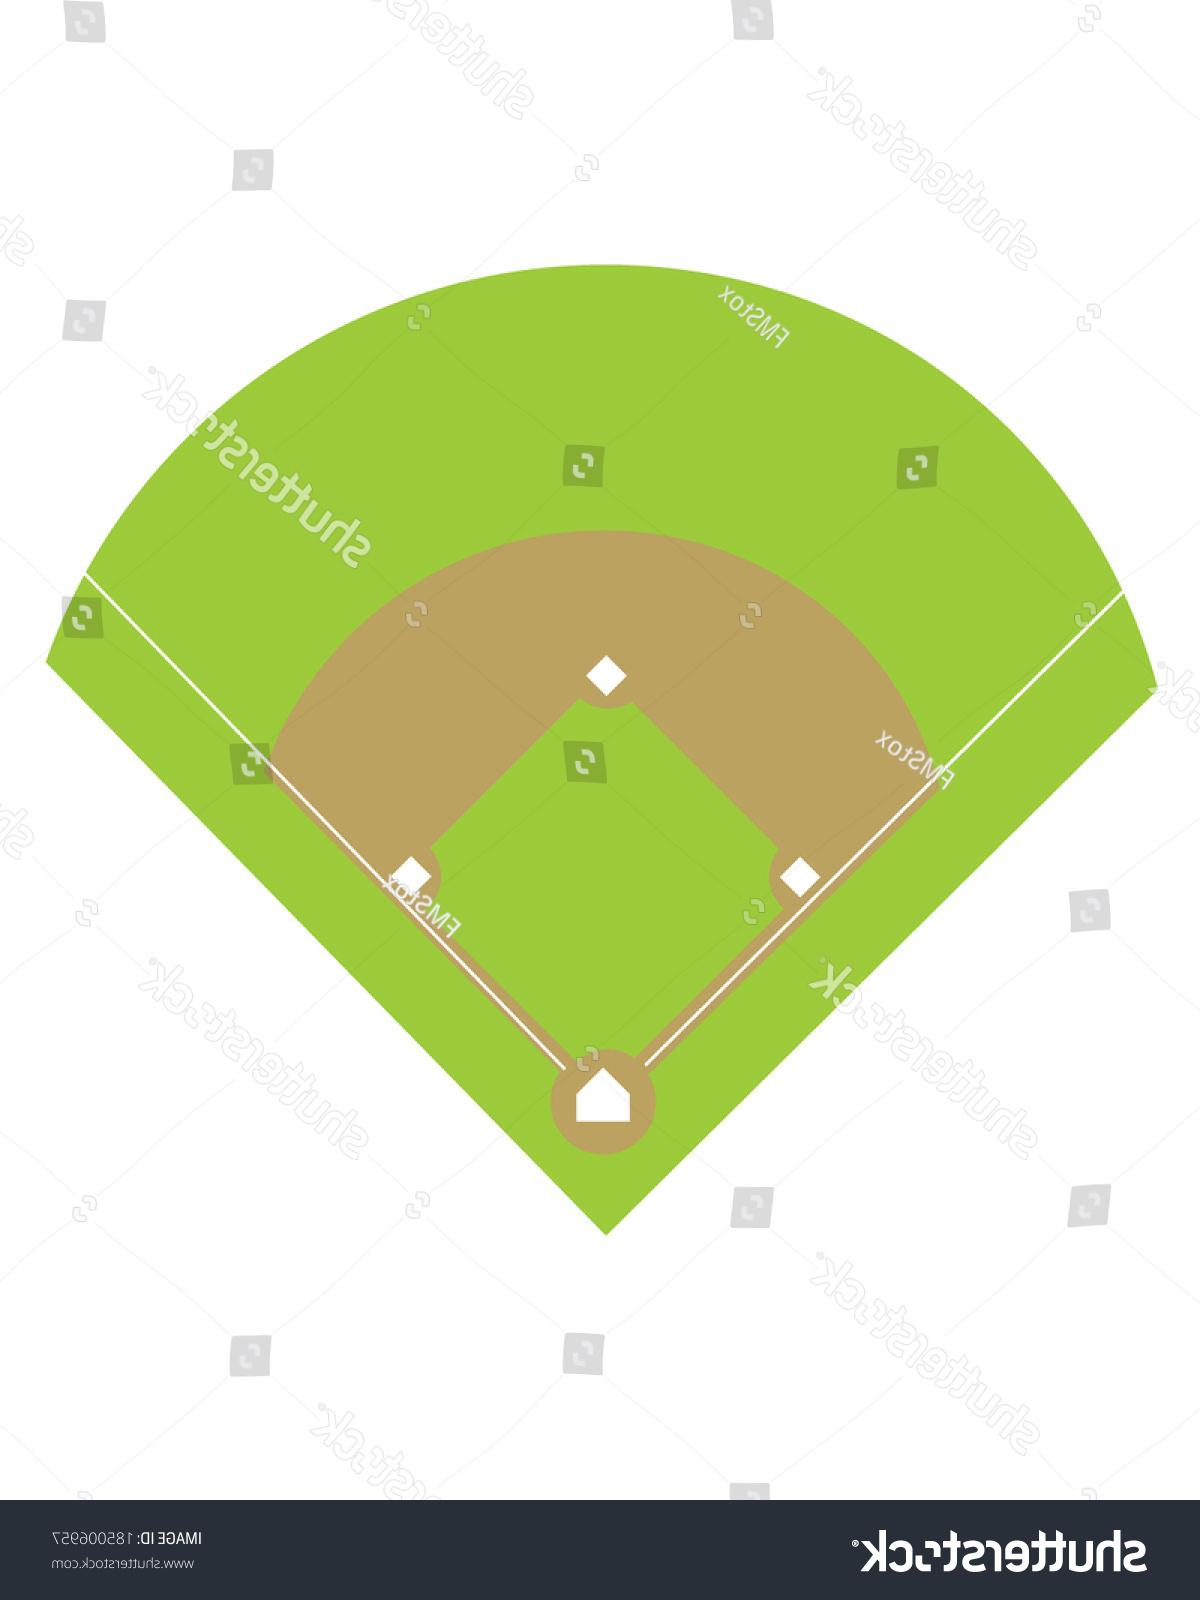 1200x1600 Hd Stock Vector Baseball Diamond And Field Photos